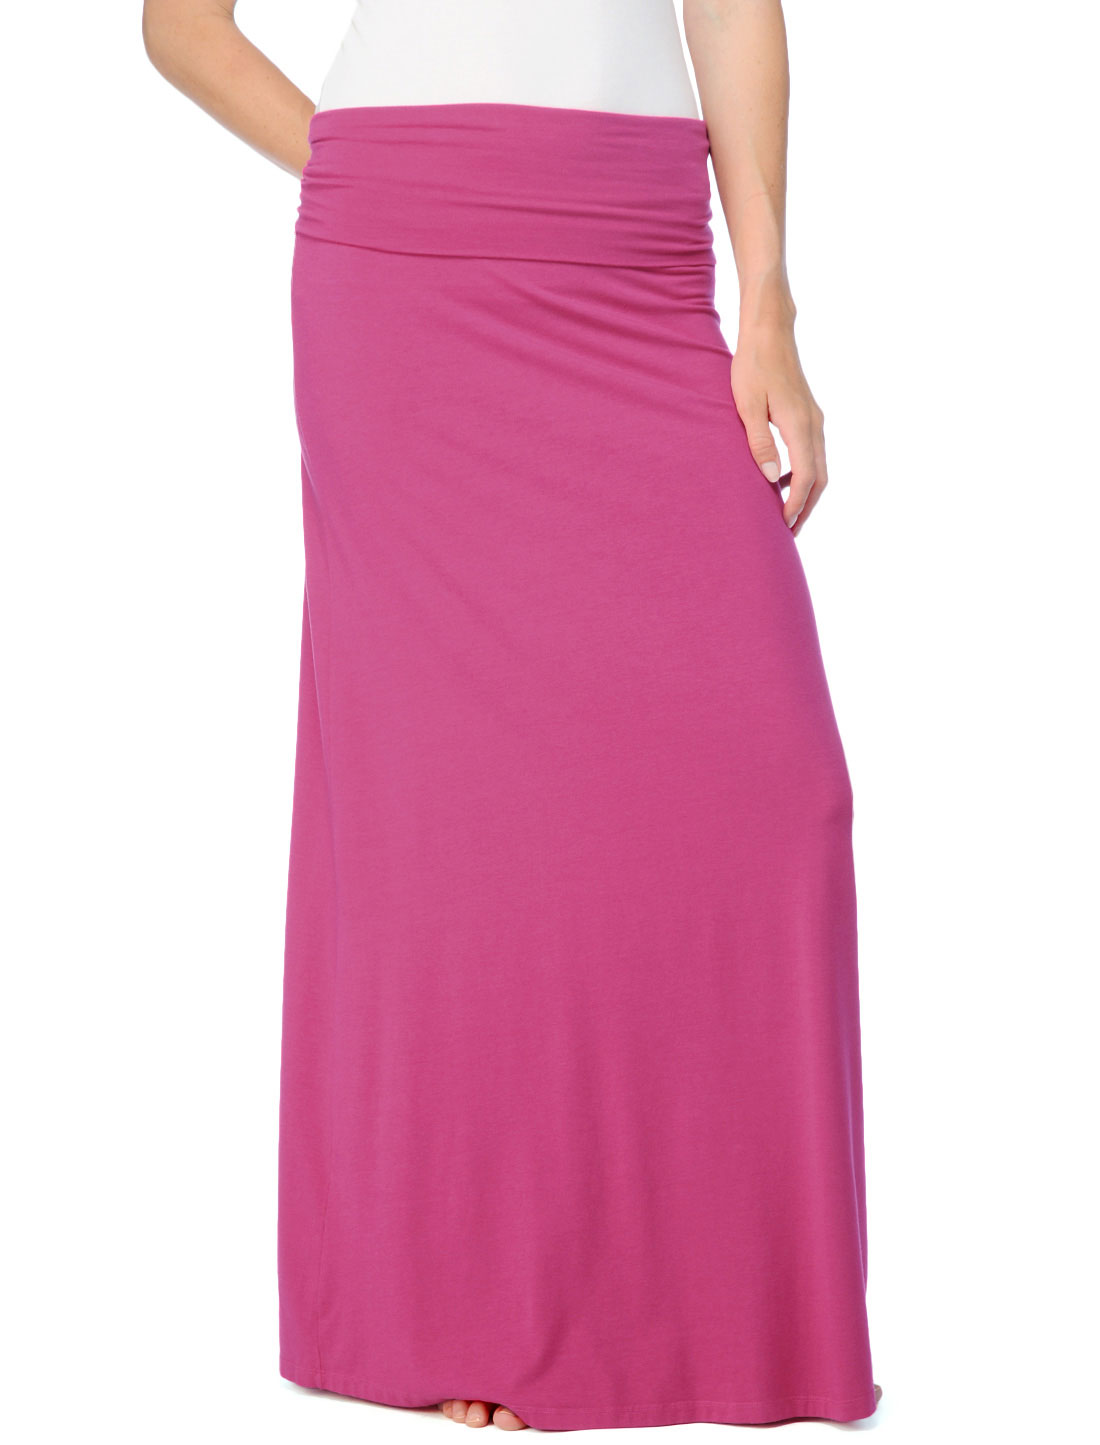 splendid modal lycra maxi skirt in pink fruit punch lyst